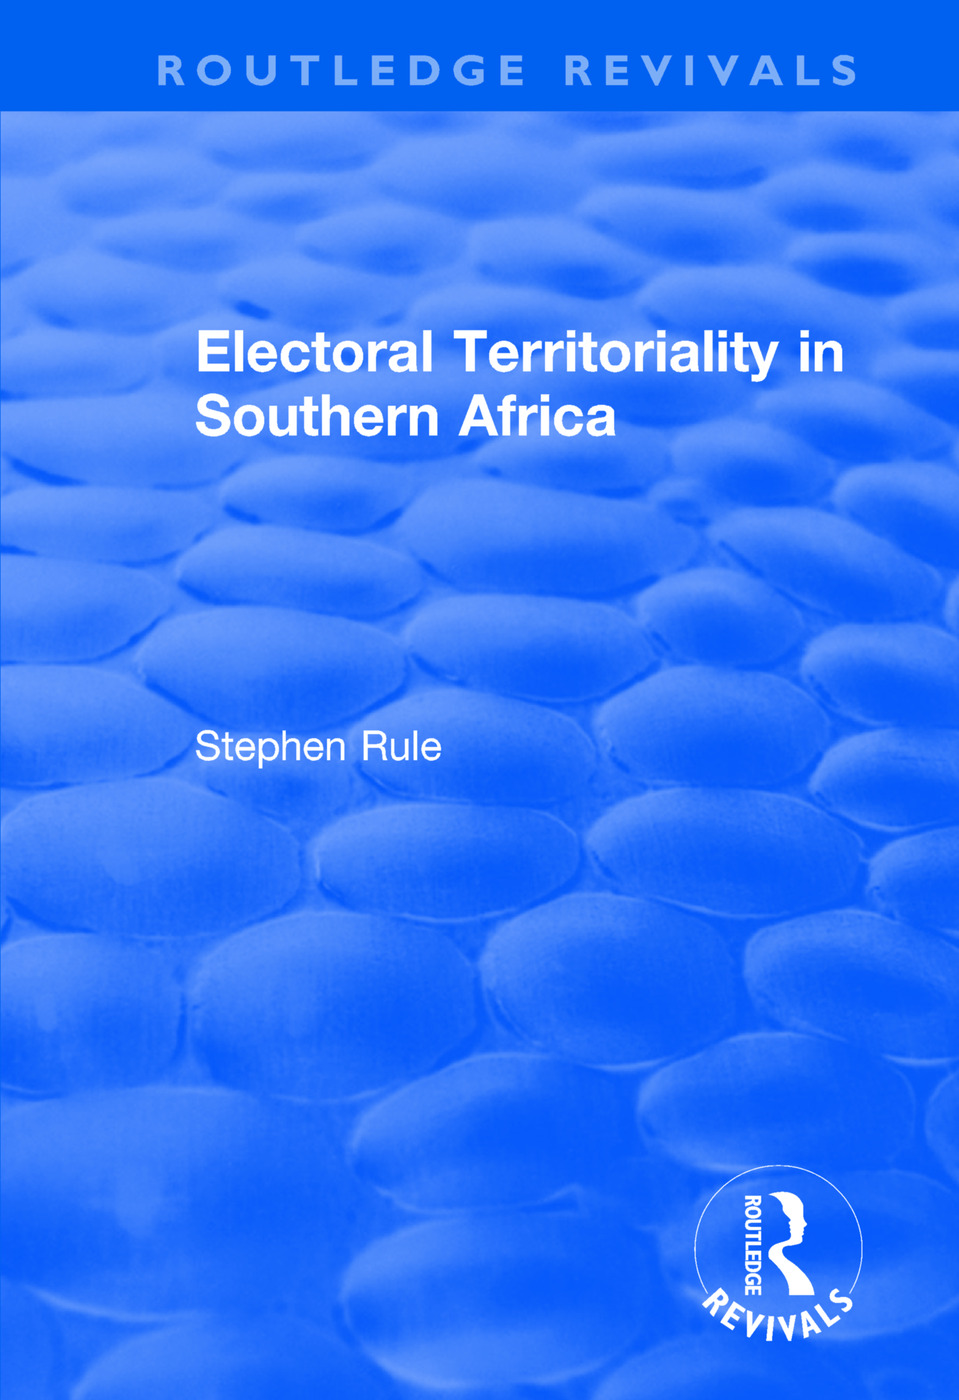 Conclusions: Electoral Territorialism